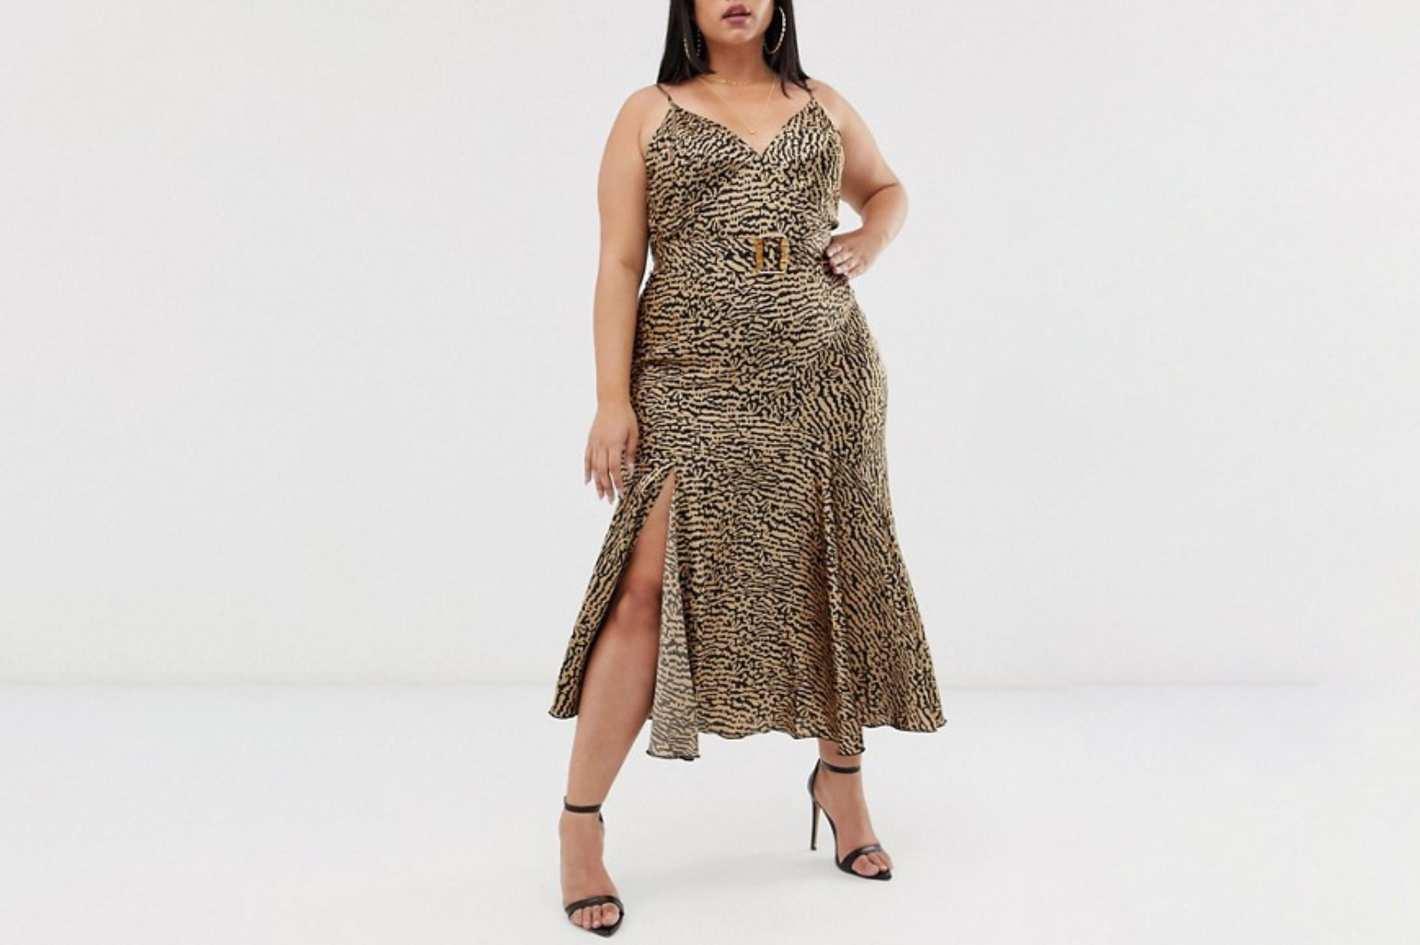 ASOS Curve Bias Cut Maxi Slip Dress in Leopard Print with Bamboo Belt